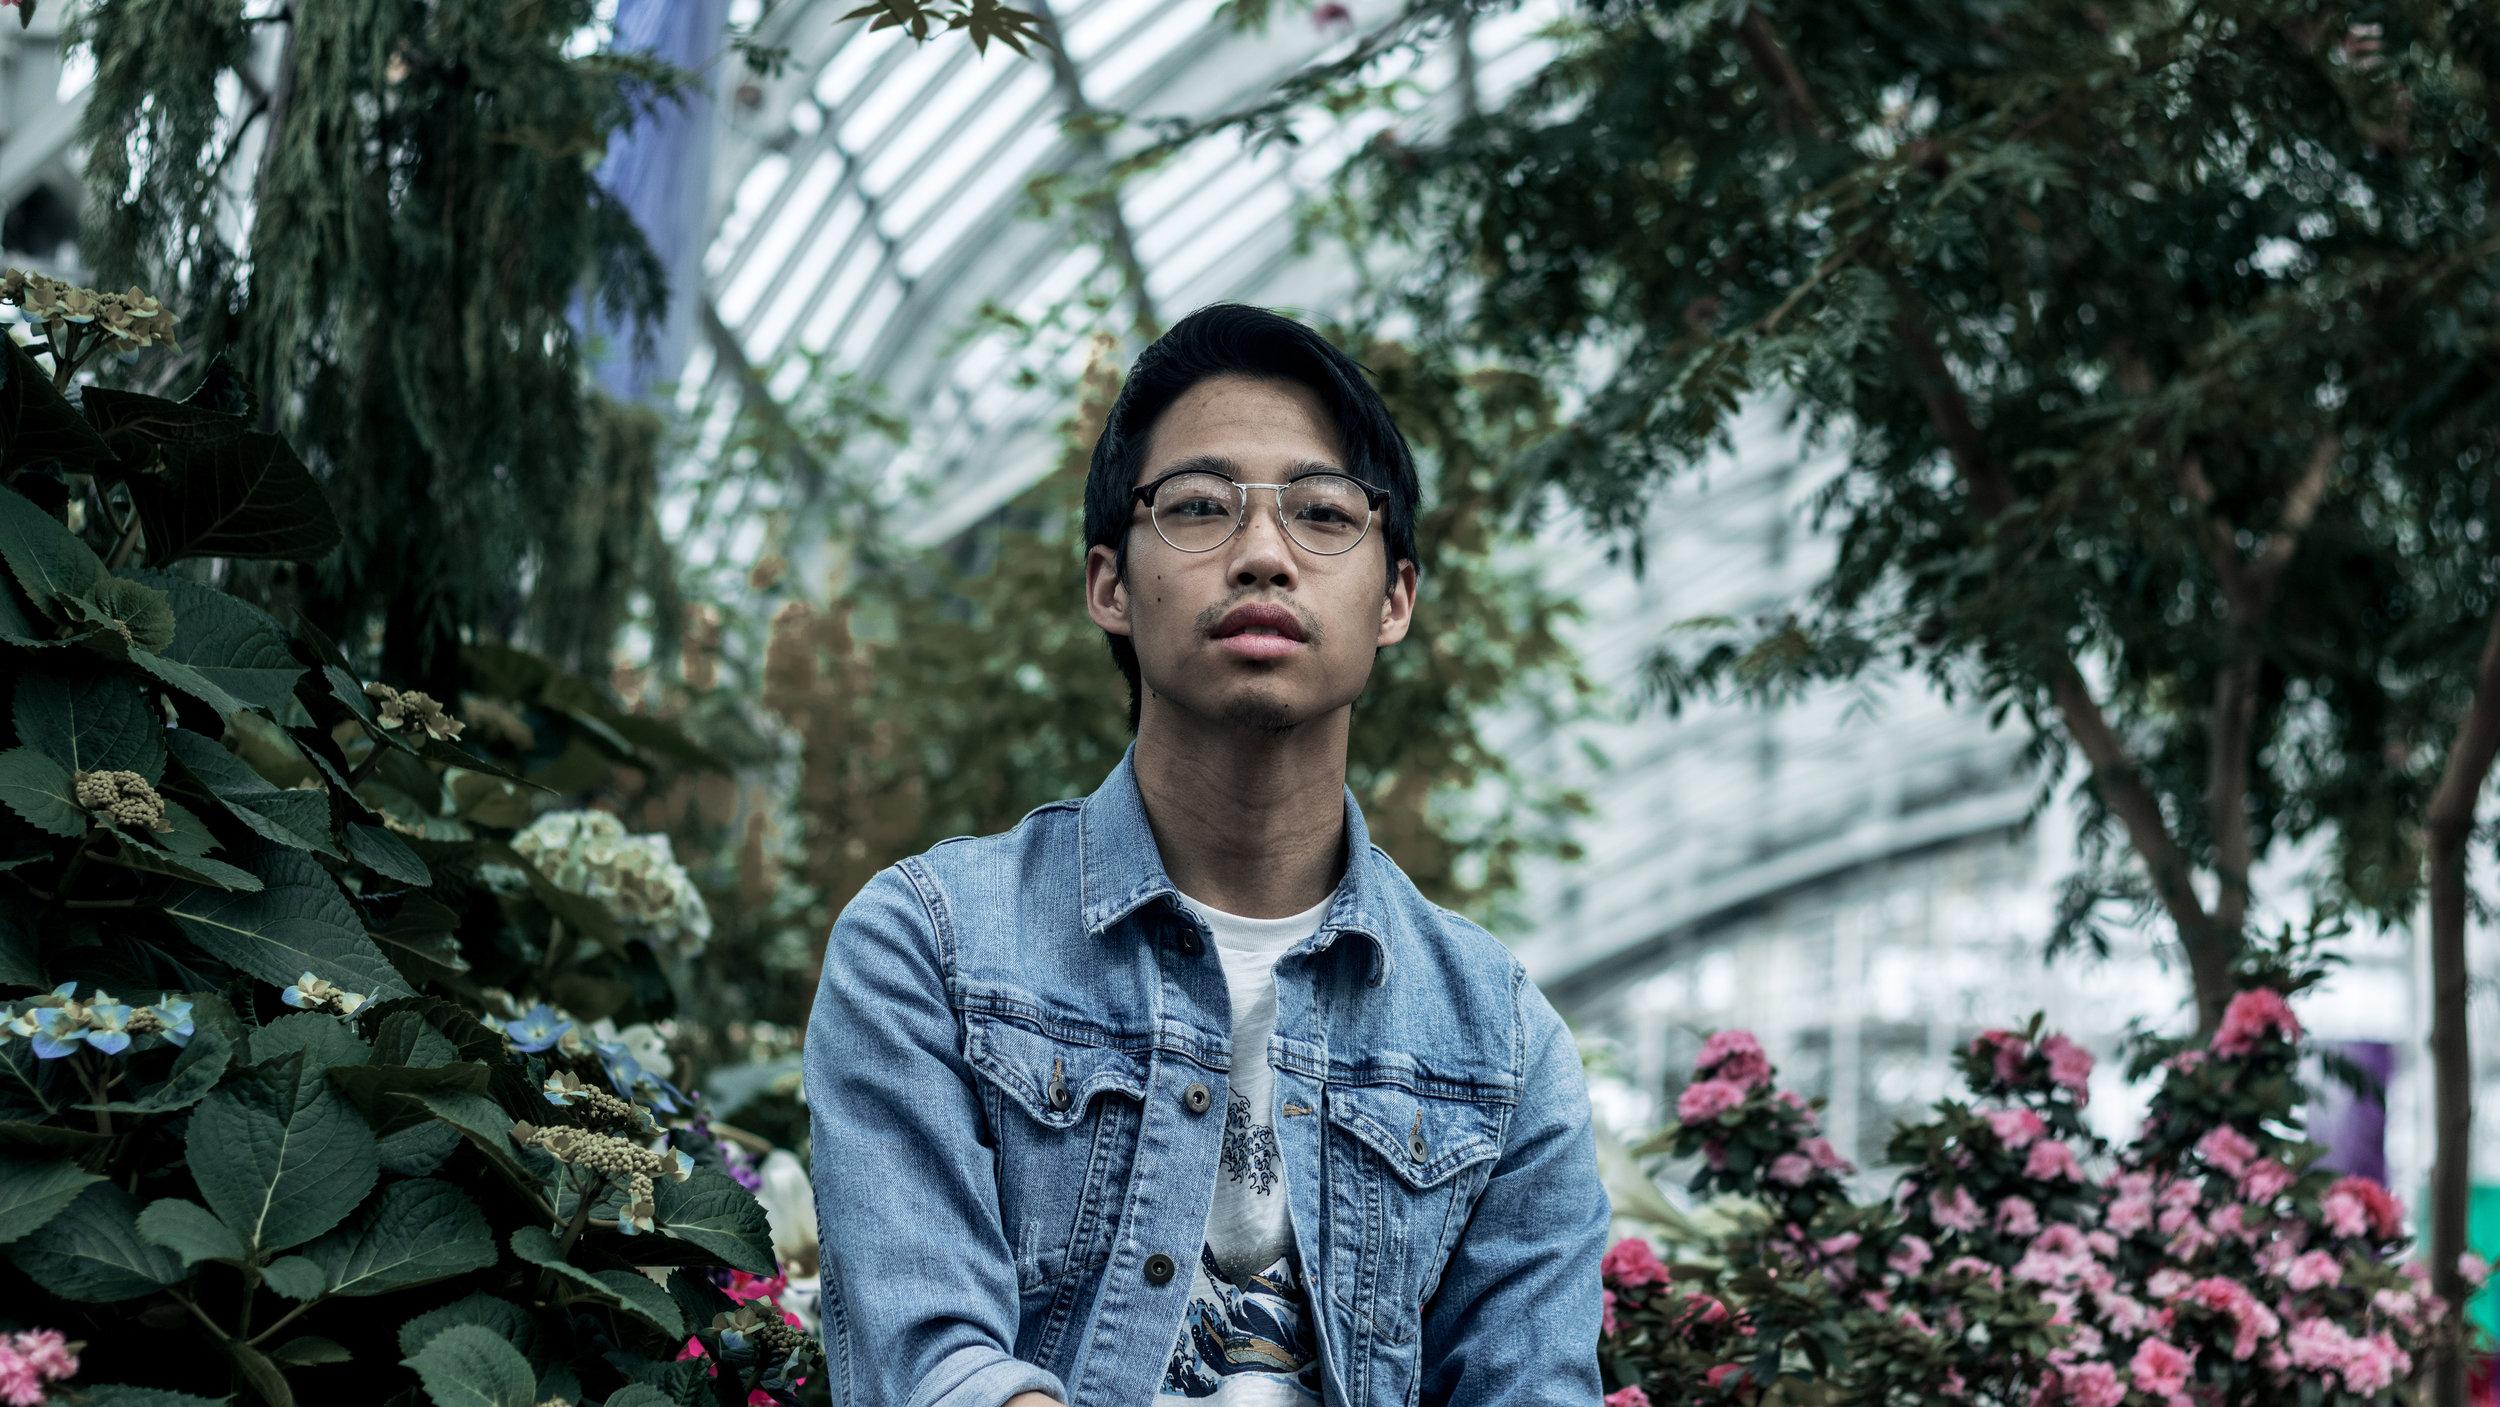 Nathan Kwon - Field: Music / PhotographyTime in field:Music (15 Years) / Photography (3 Years)Comfort food: 김치찌개 (Kimchi jjigae)